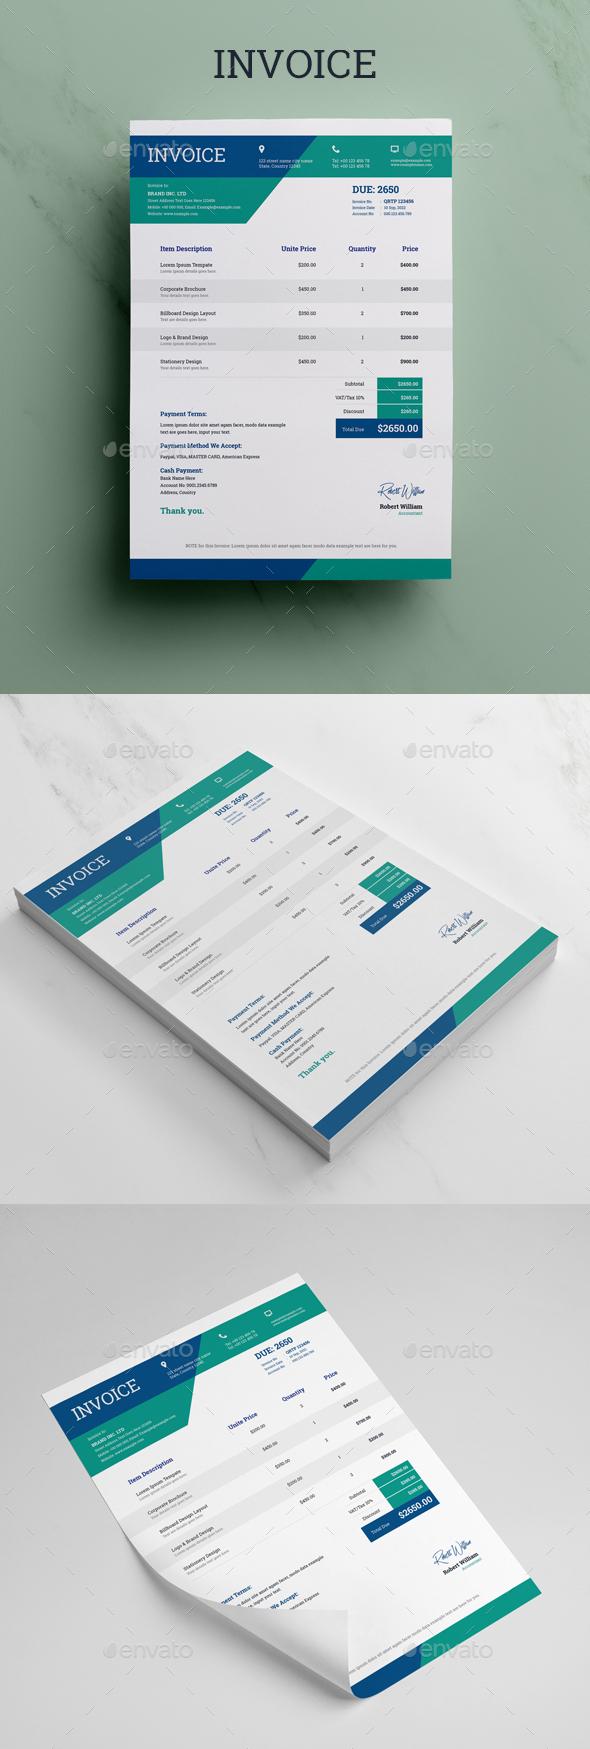 Invoice Templates Graphics Designs Templates